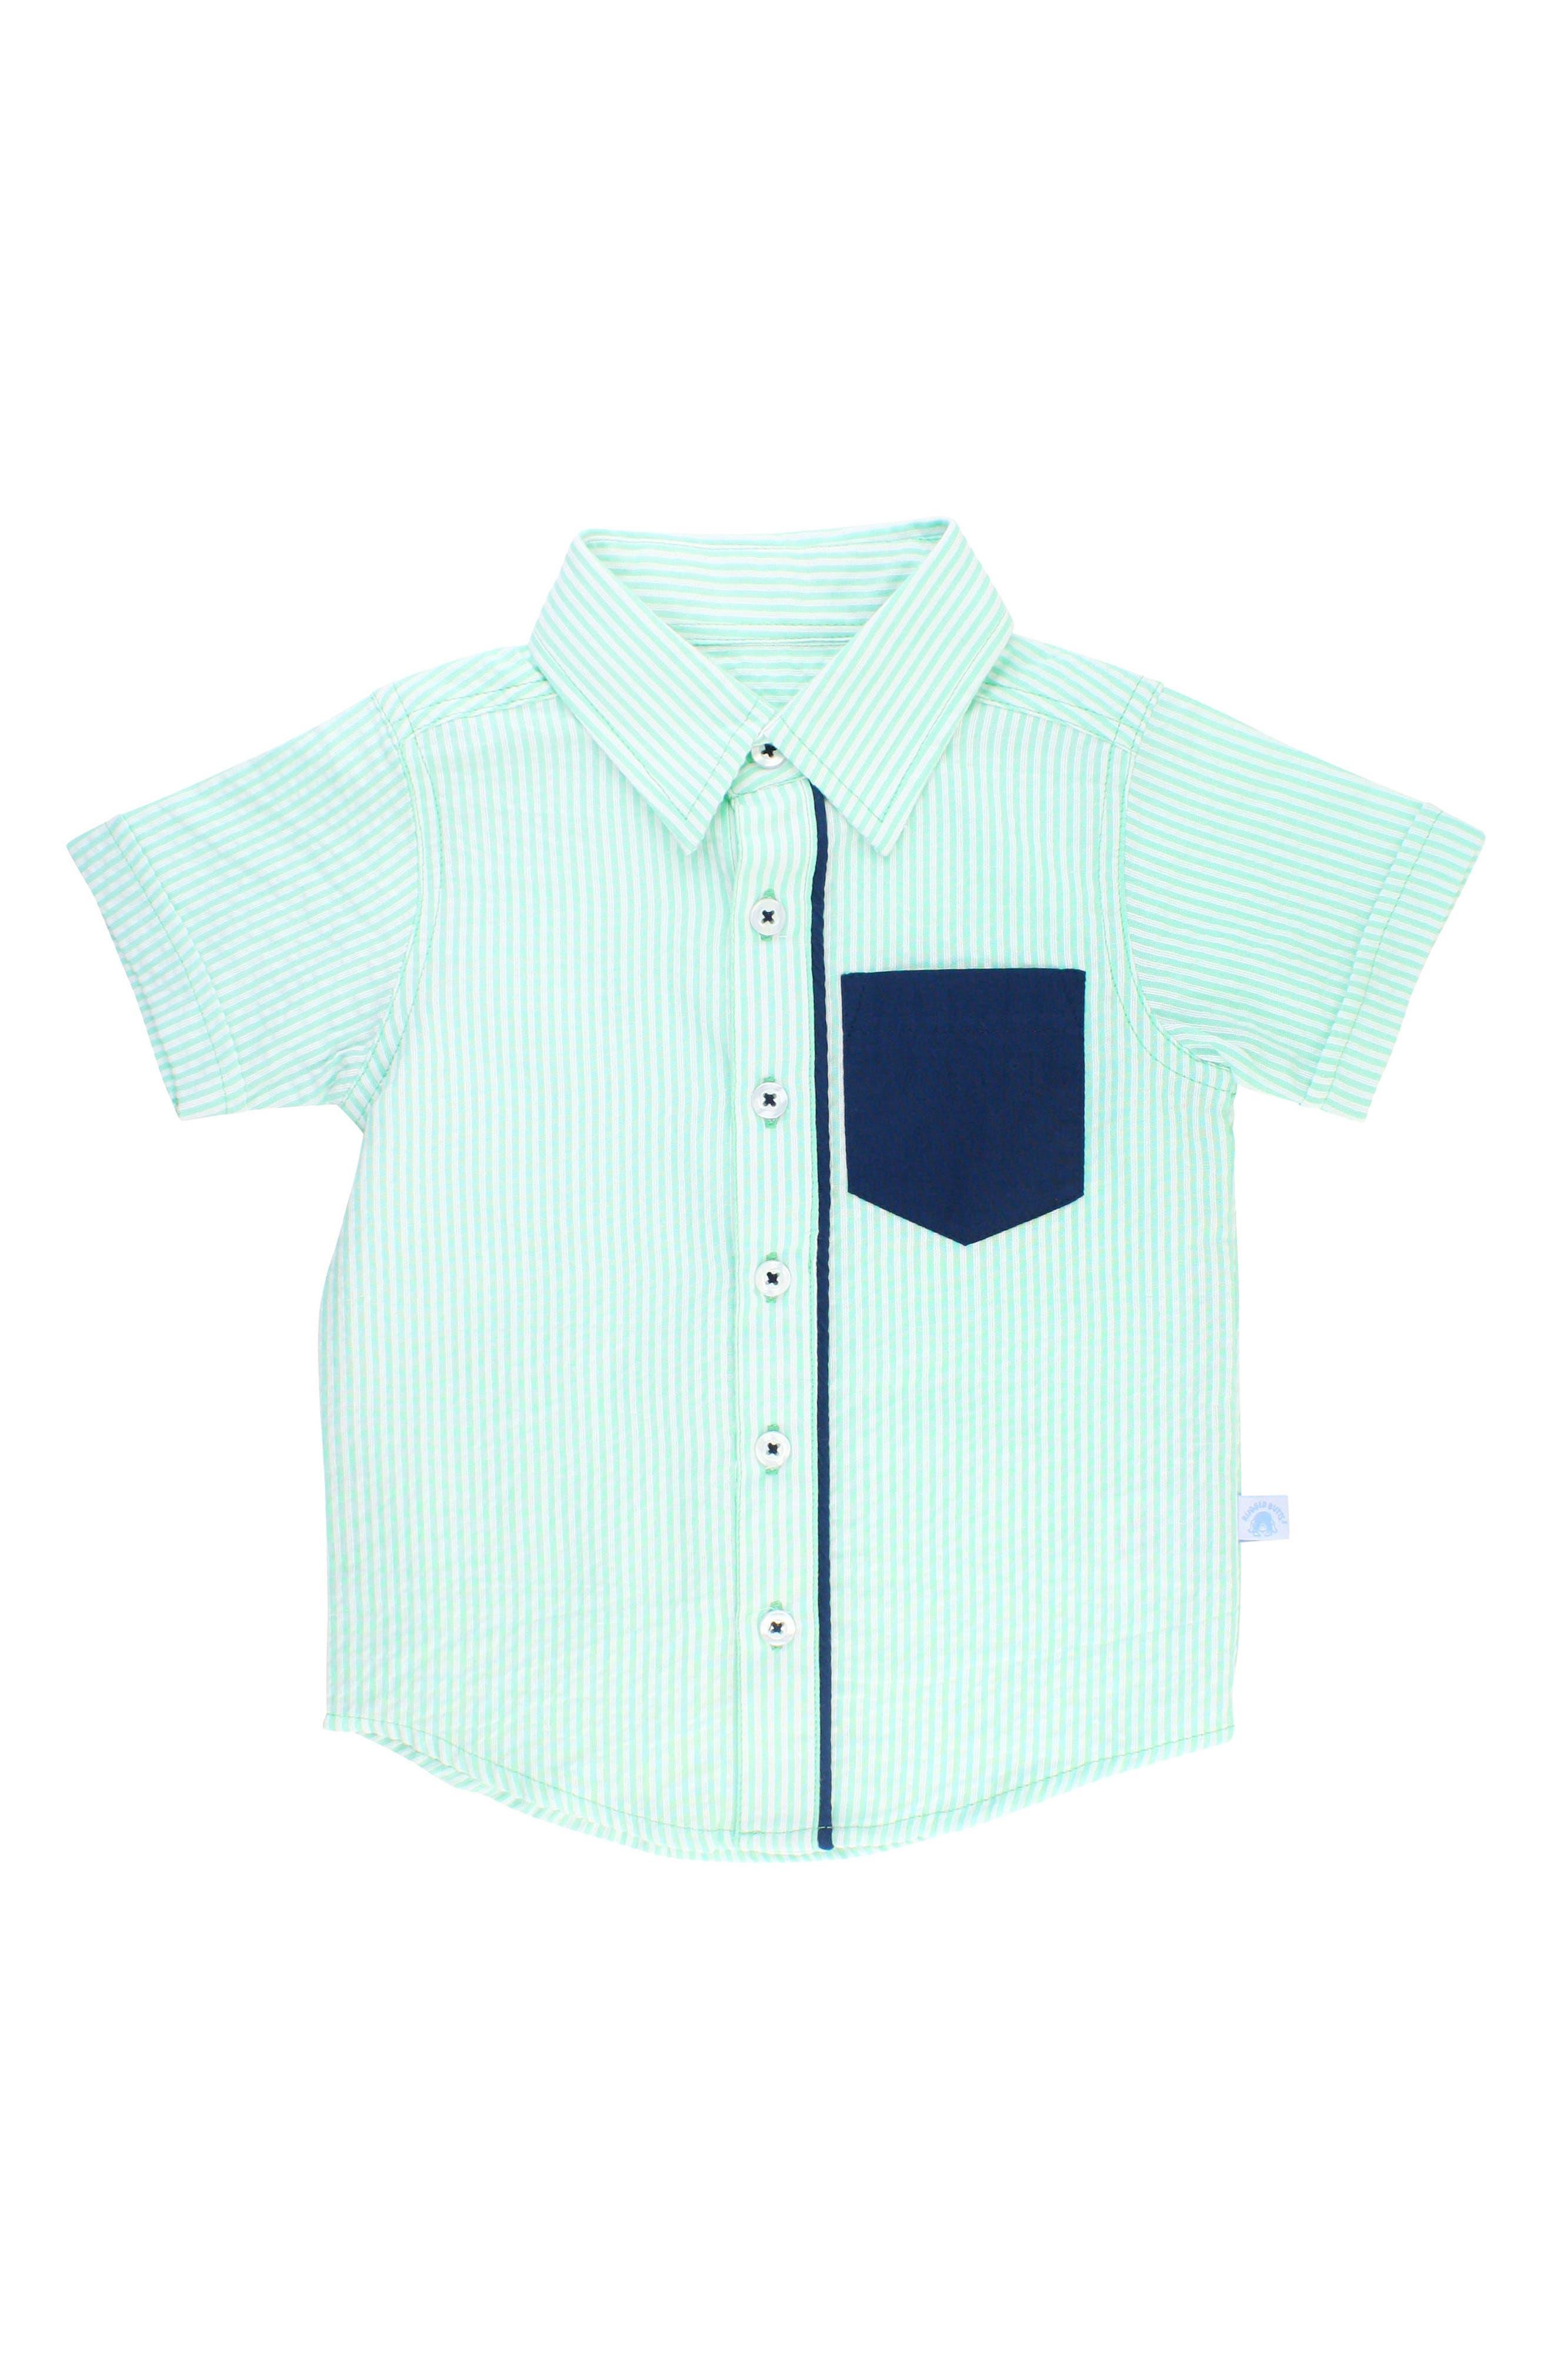 Seersucker Stripe Woven Shirt,                         Main,                         color, 300